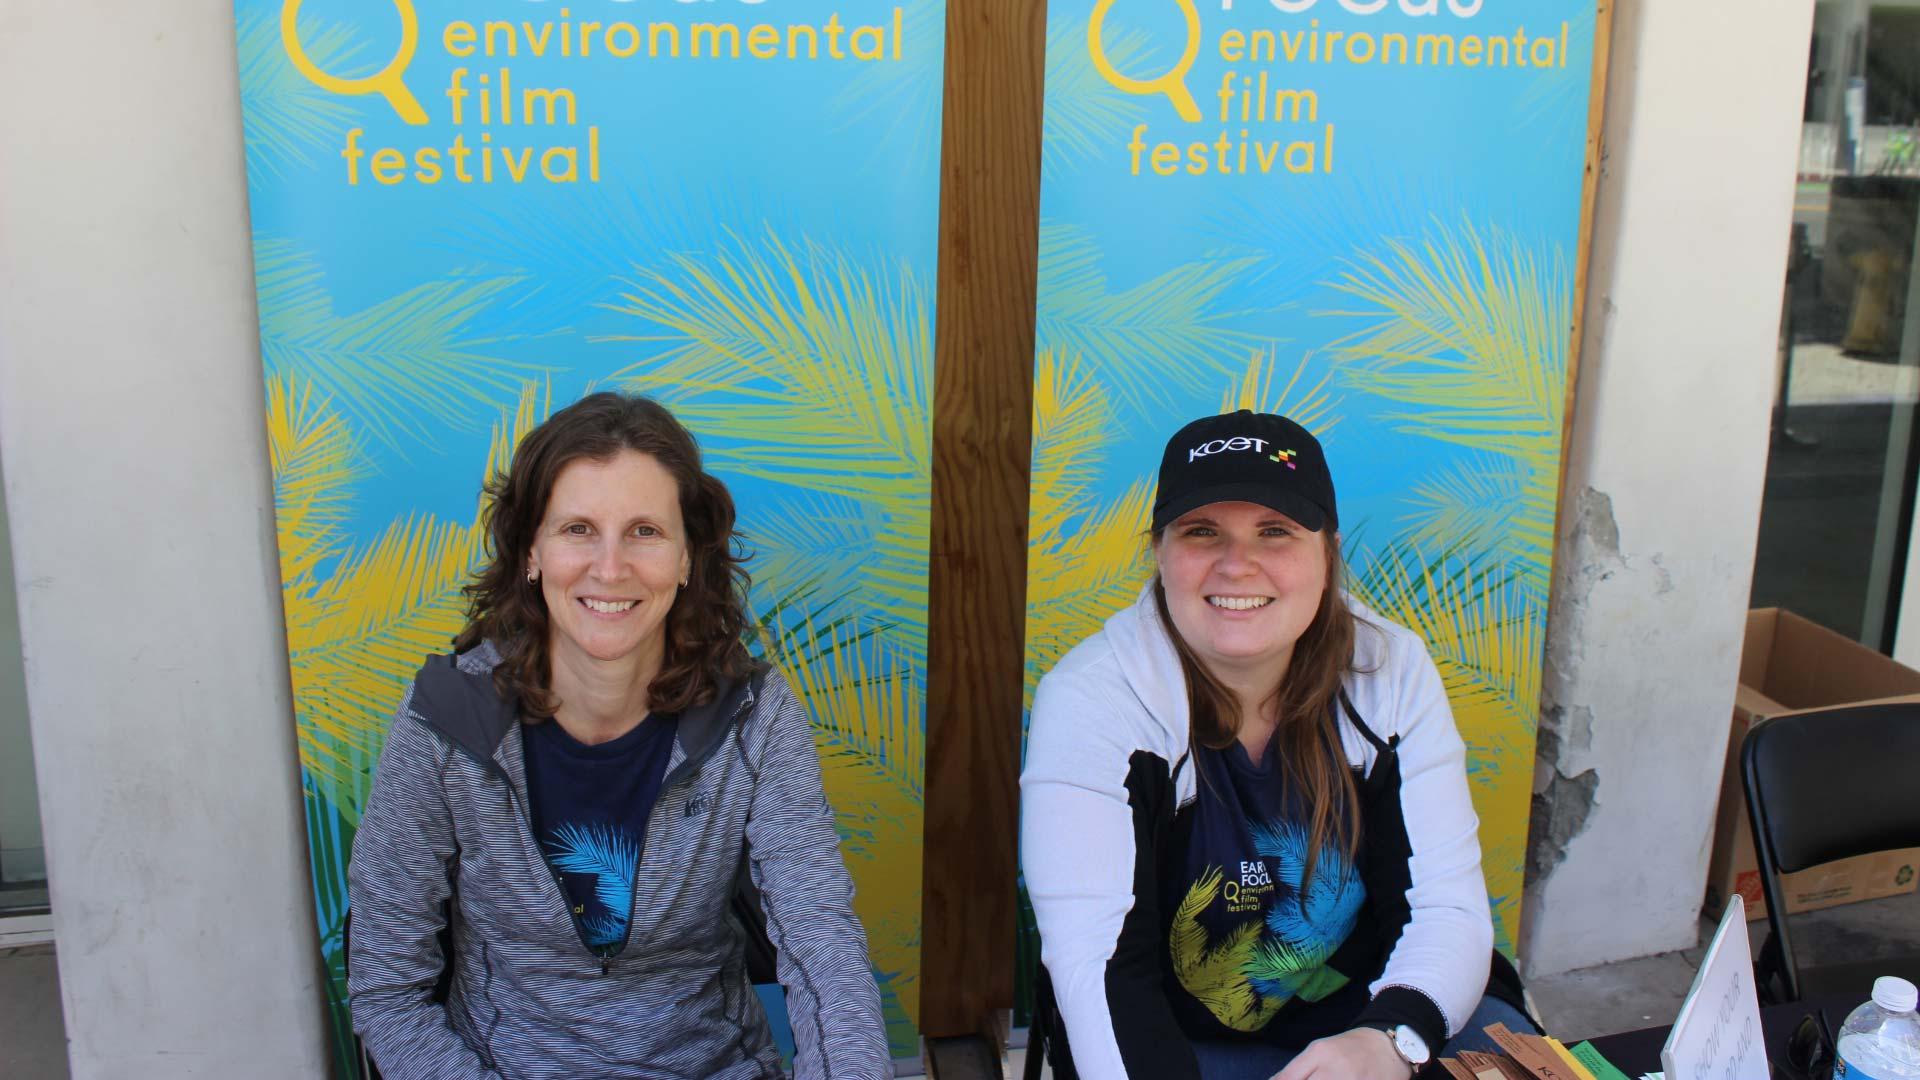 earth focus environmental film festival